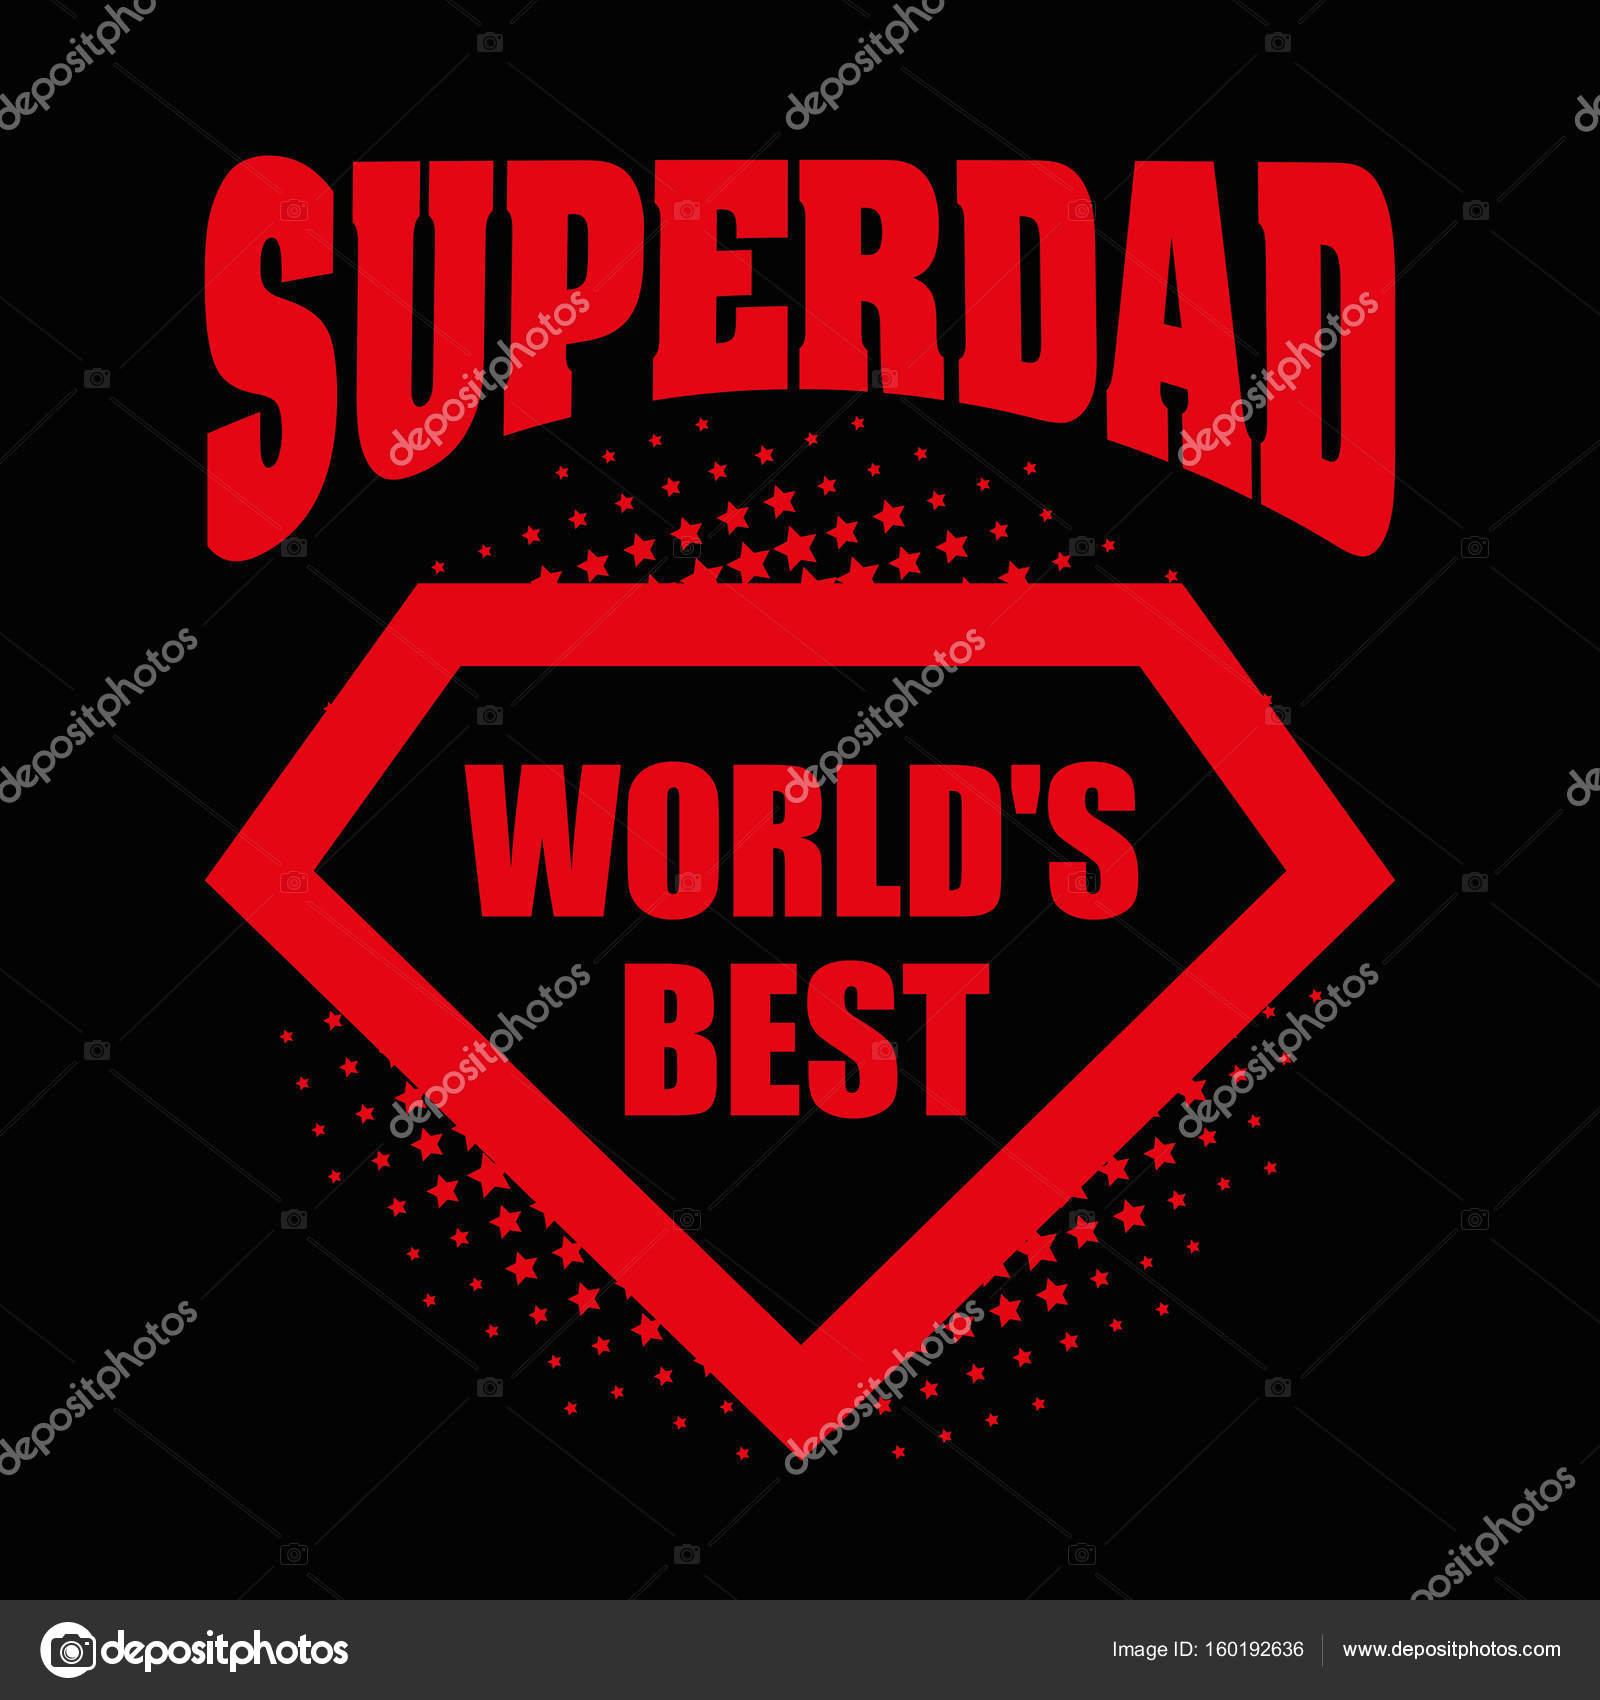 SuperDad Logo Superhelden Welt am besten — Stockvektor © ichbinsam ...